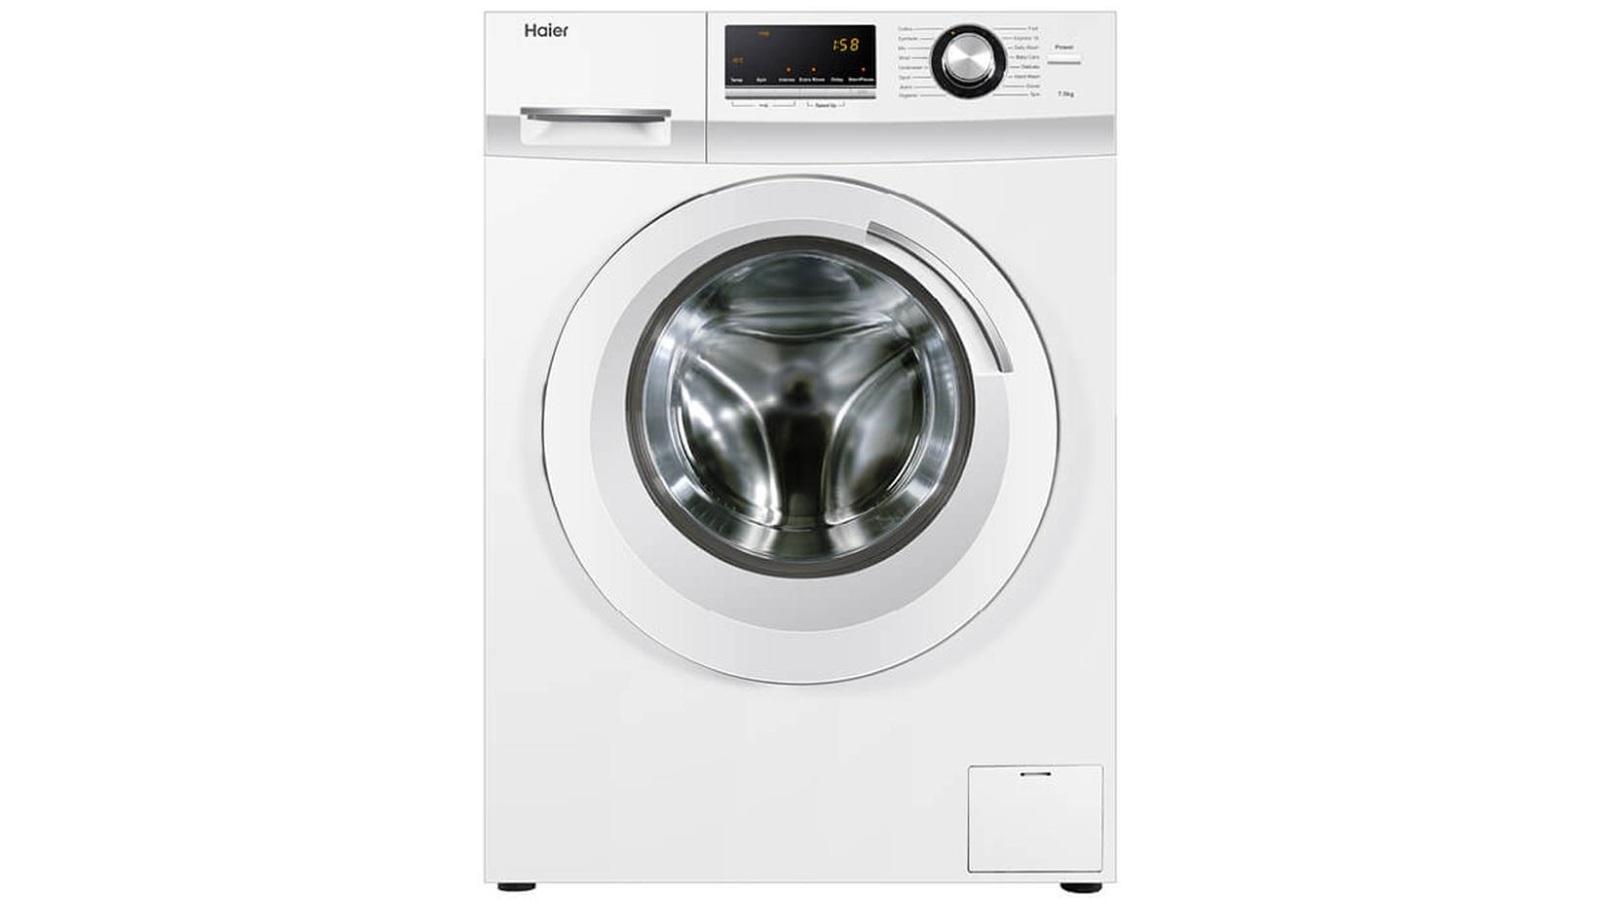 TCL复式分类洗衣机P10发布 主打分类健康洗护